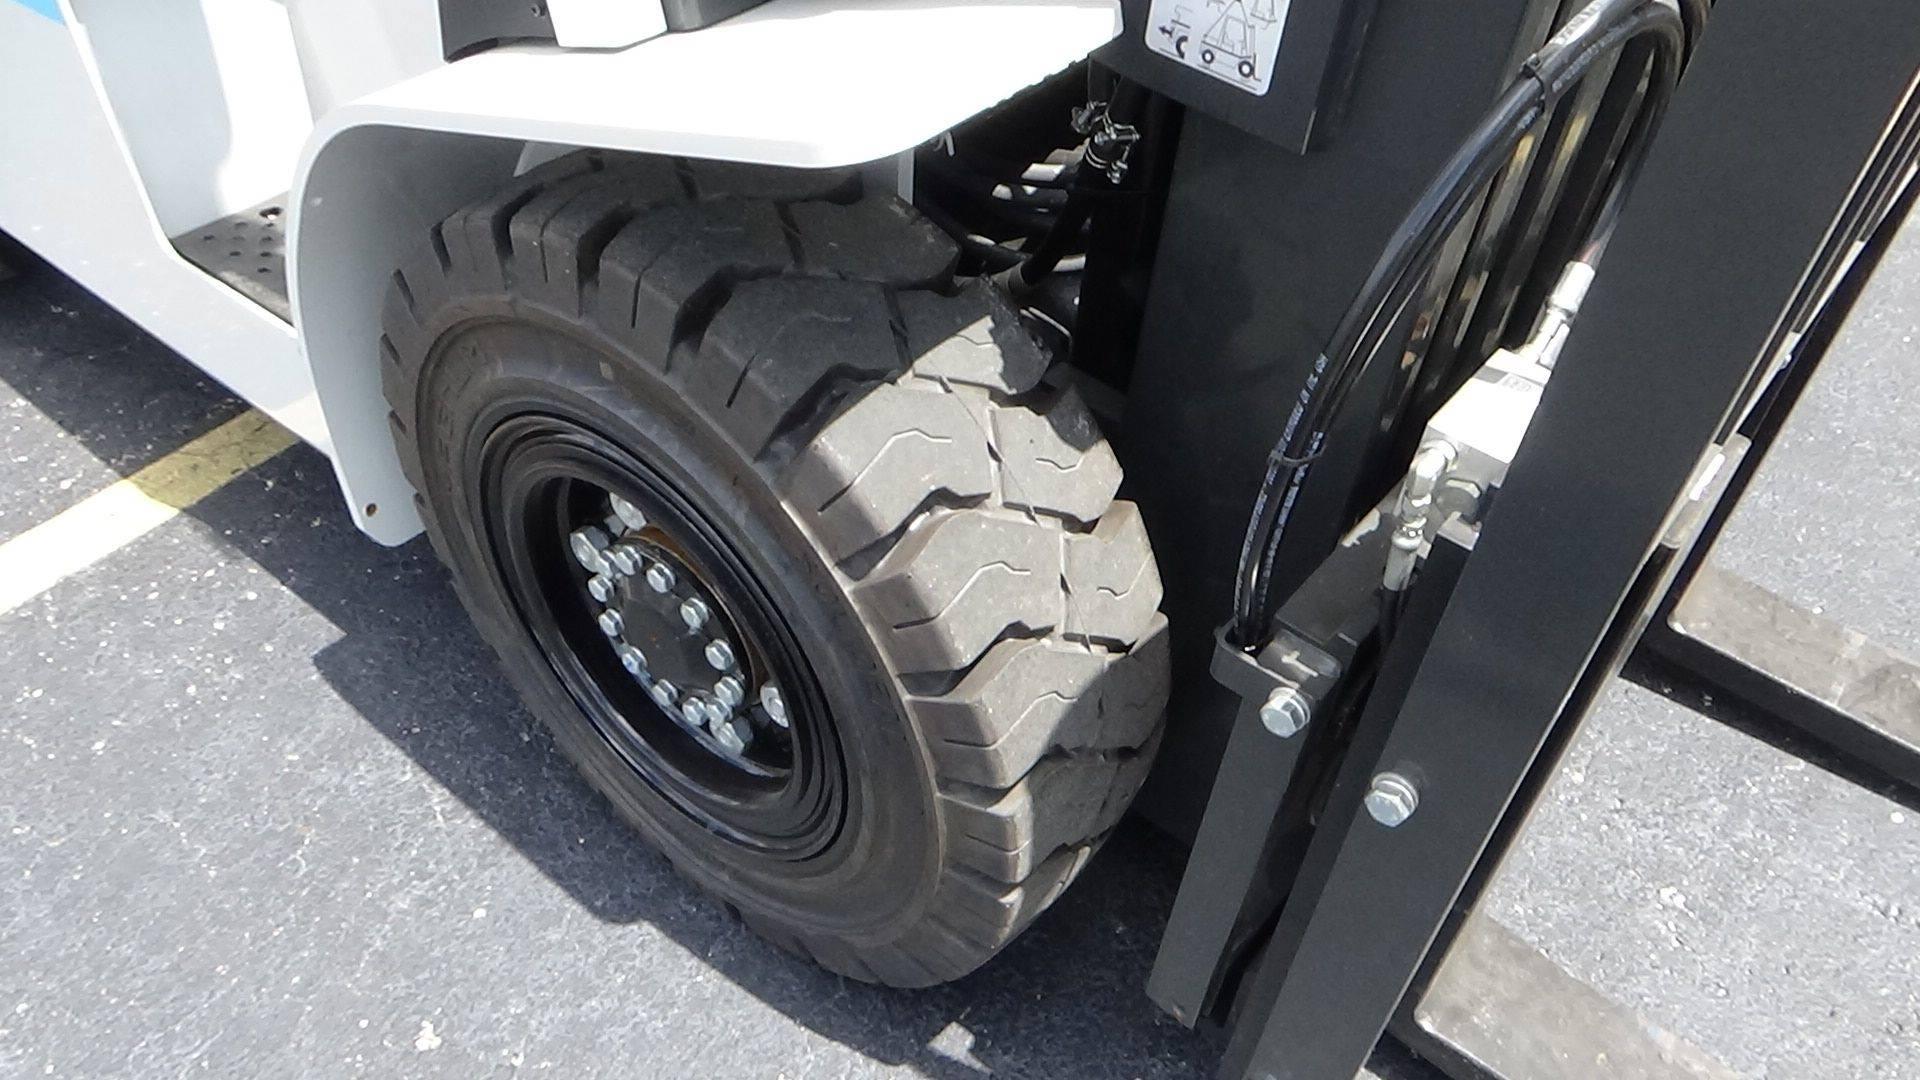 2019 Lp Gas Unicarriers Pf100 Pneumatic Tire 4 Wheel Sit Down